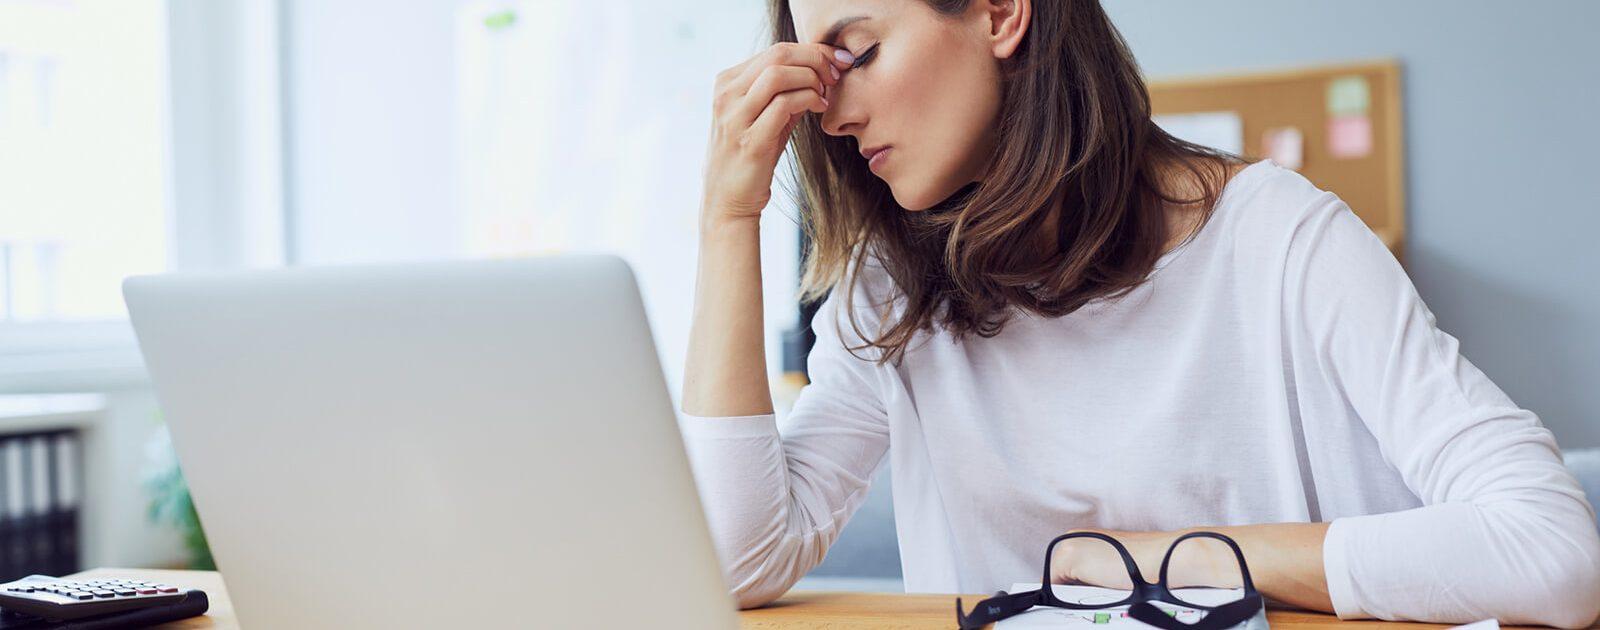 Gestresste Frau vor Laptop leidet an Hämorrhoiden